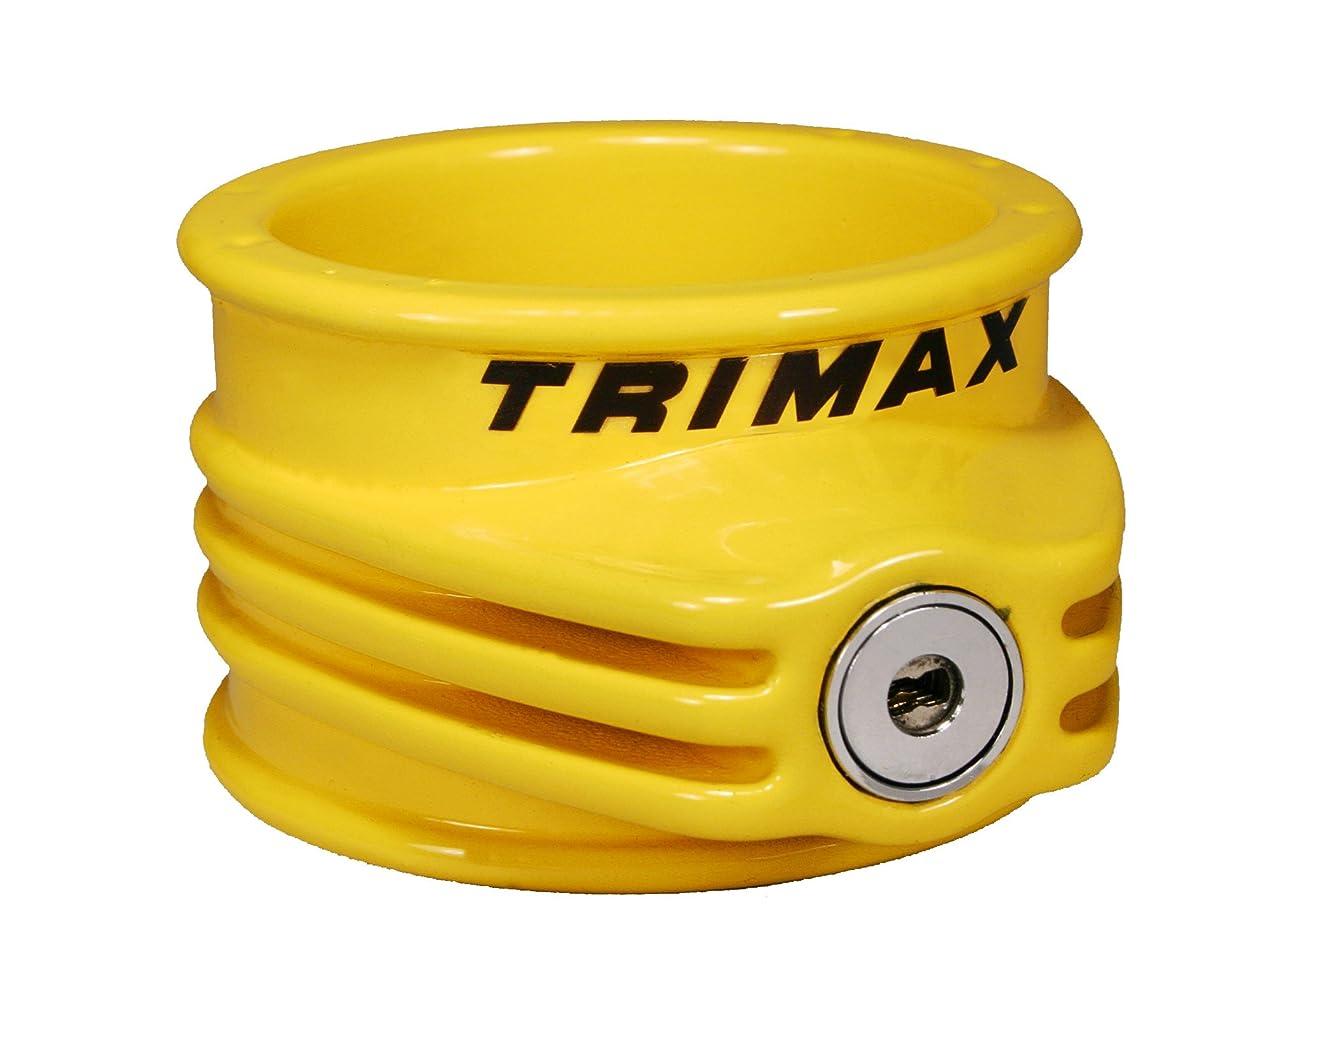 Trimax TFW55 Ultra Tough 5th Wheel Trailer Lock iouihi339905